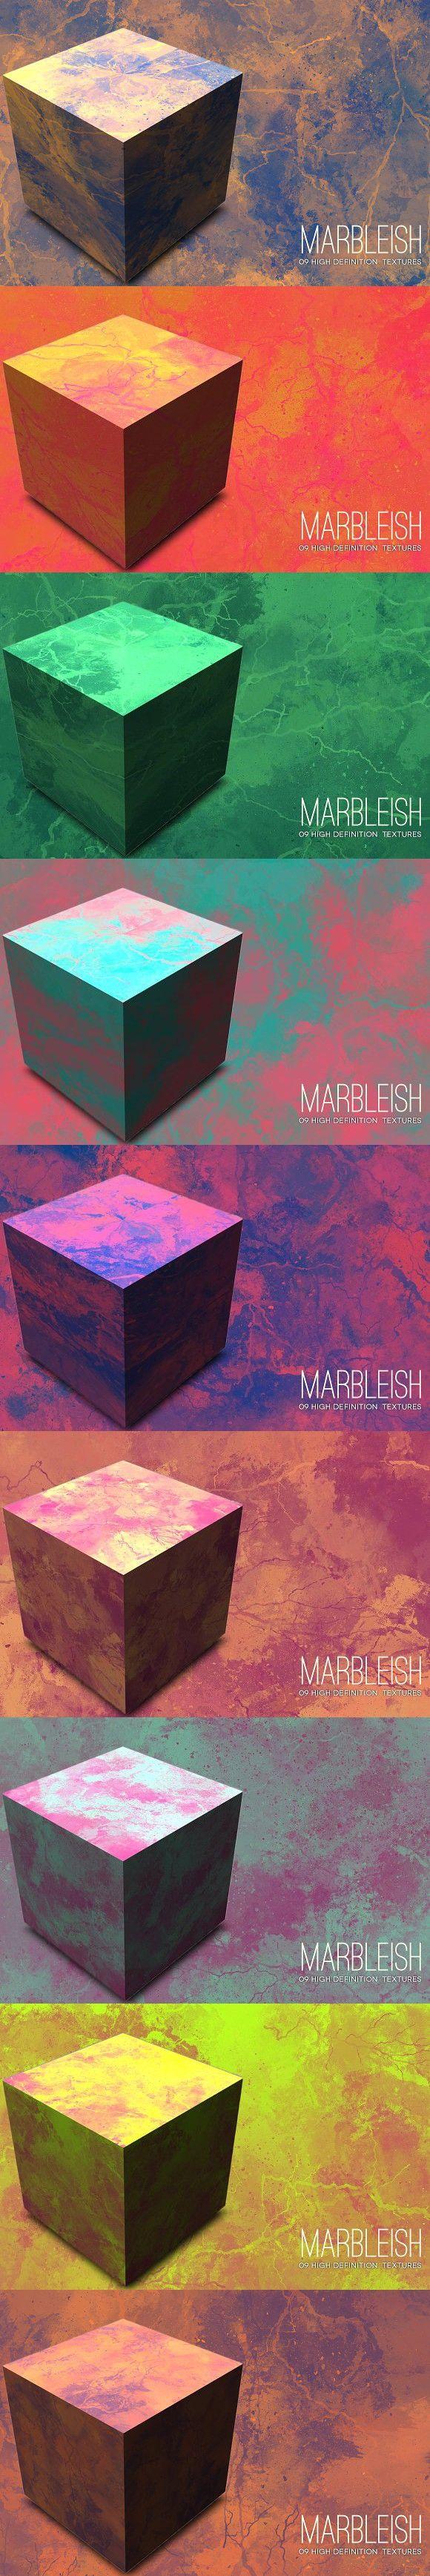 Marbleish Texture painting, Texture, App design